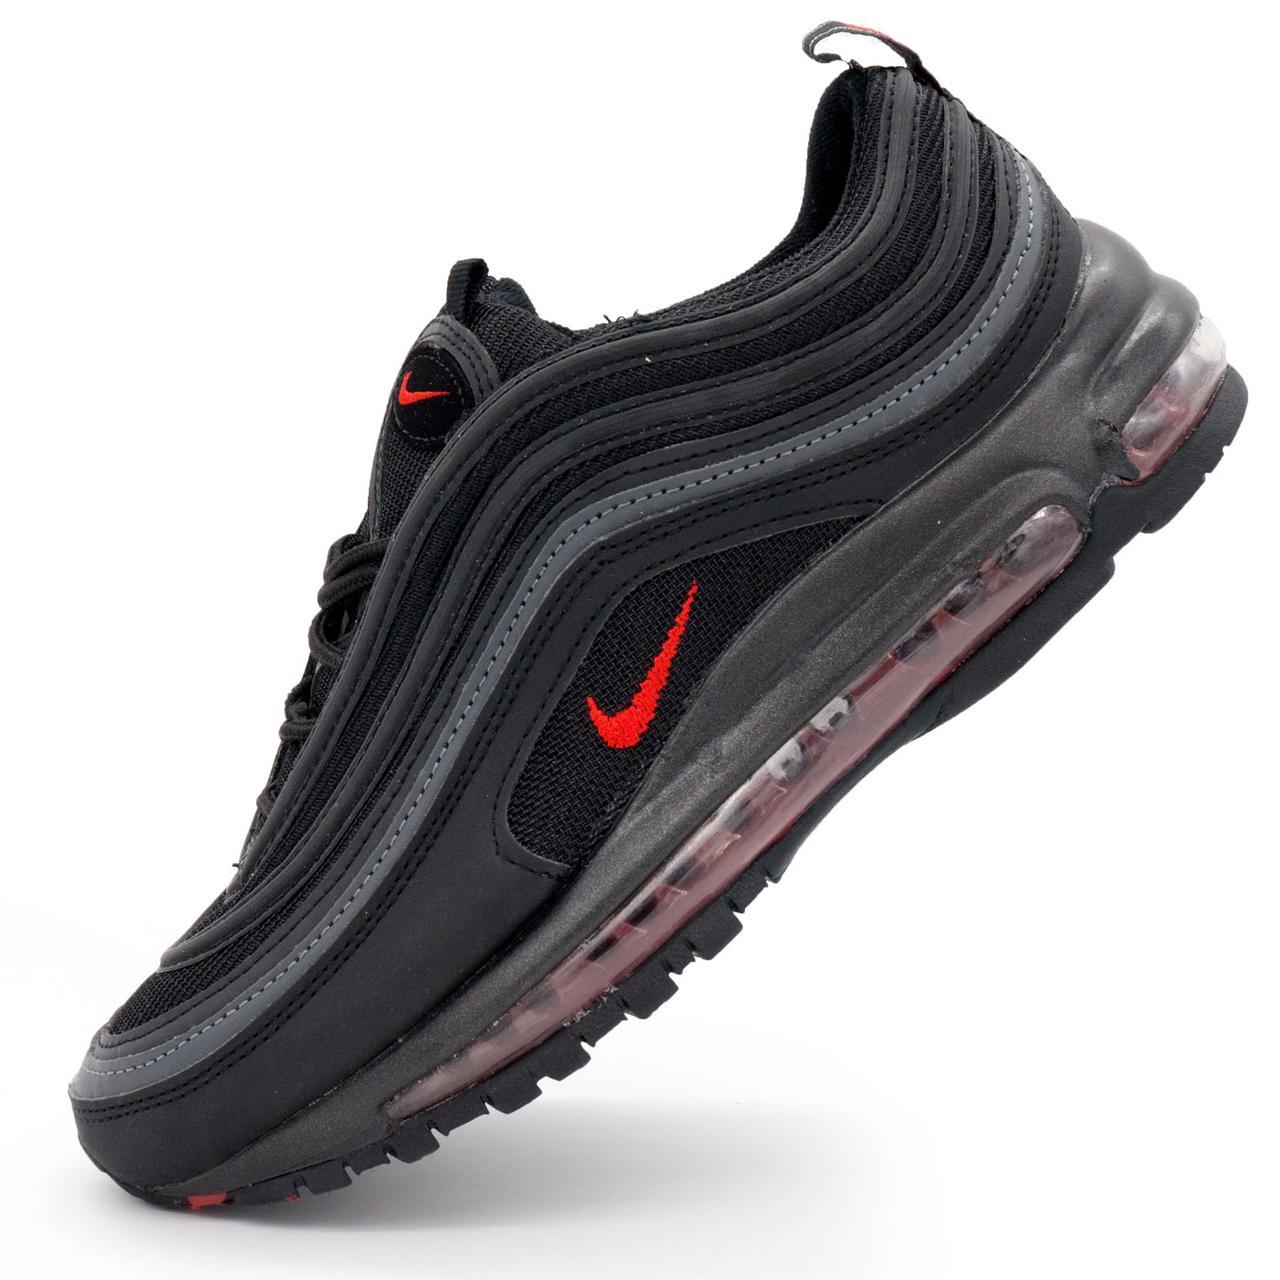 eebb6bcc Мужские кроссовки Найк Аир Макс Nike air max 97 черные р.(45), цена ...